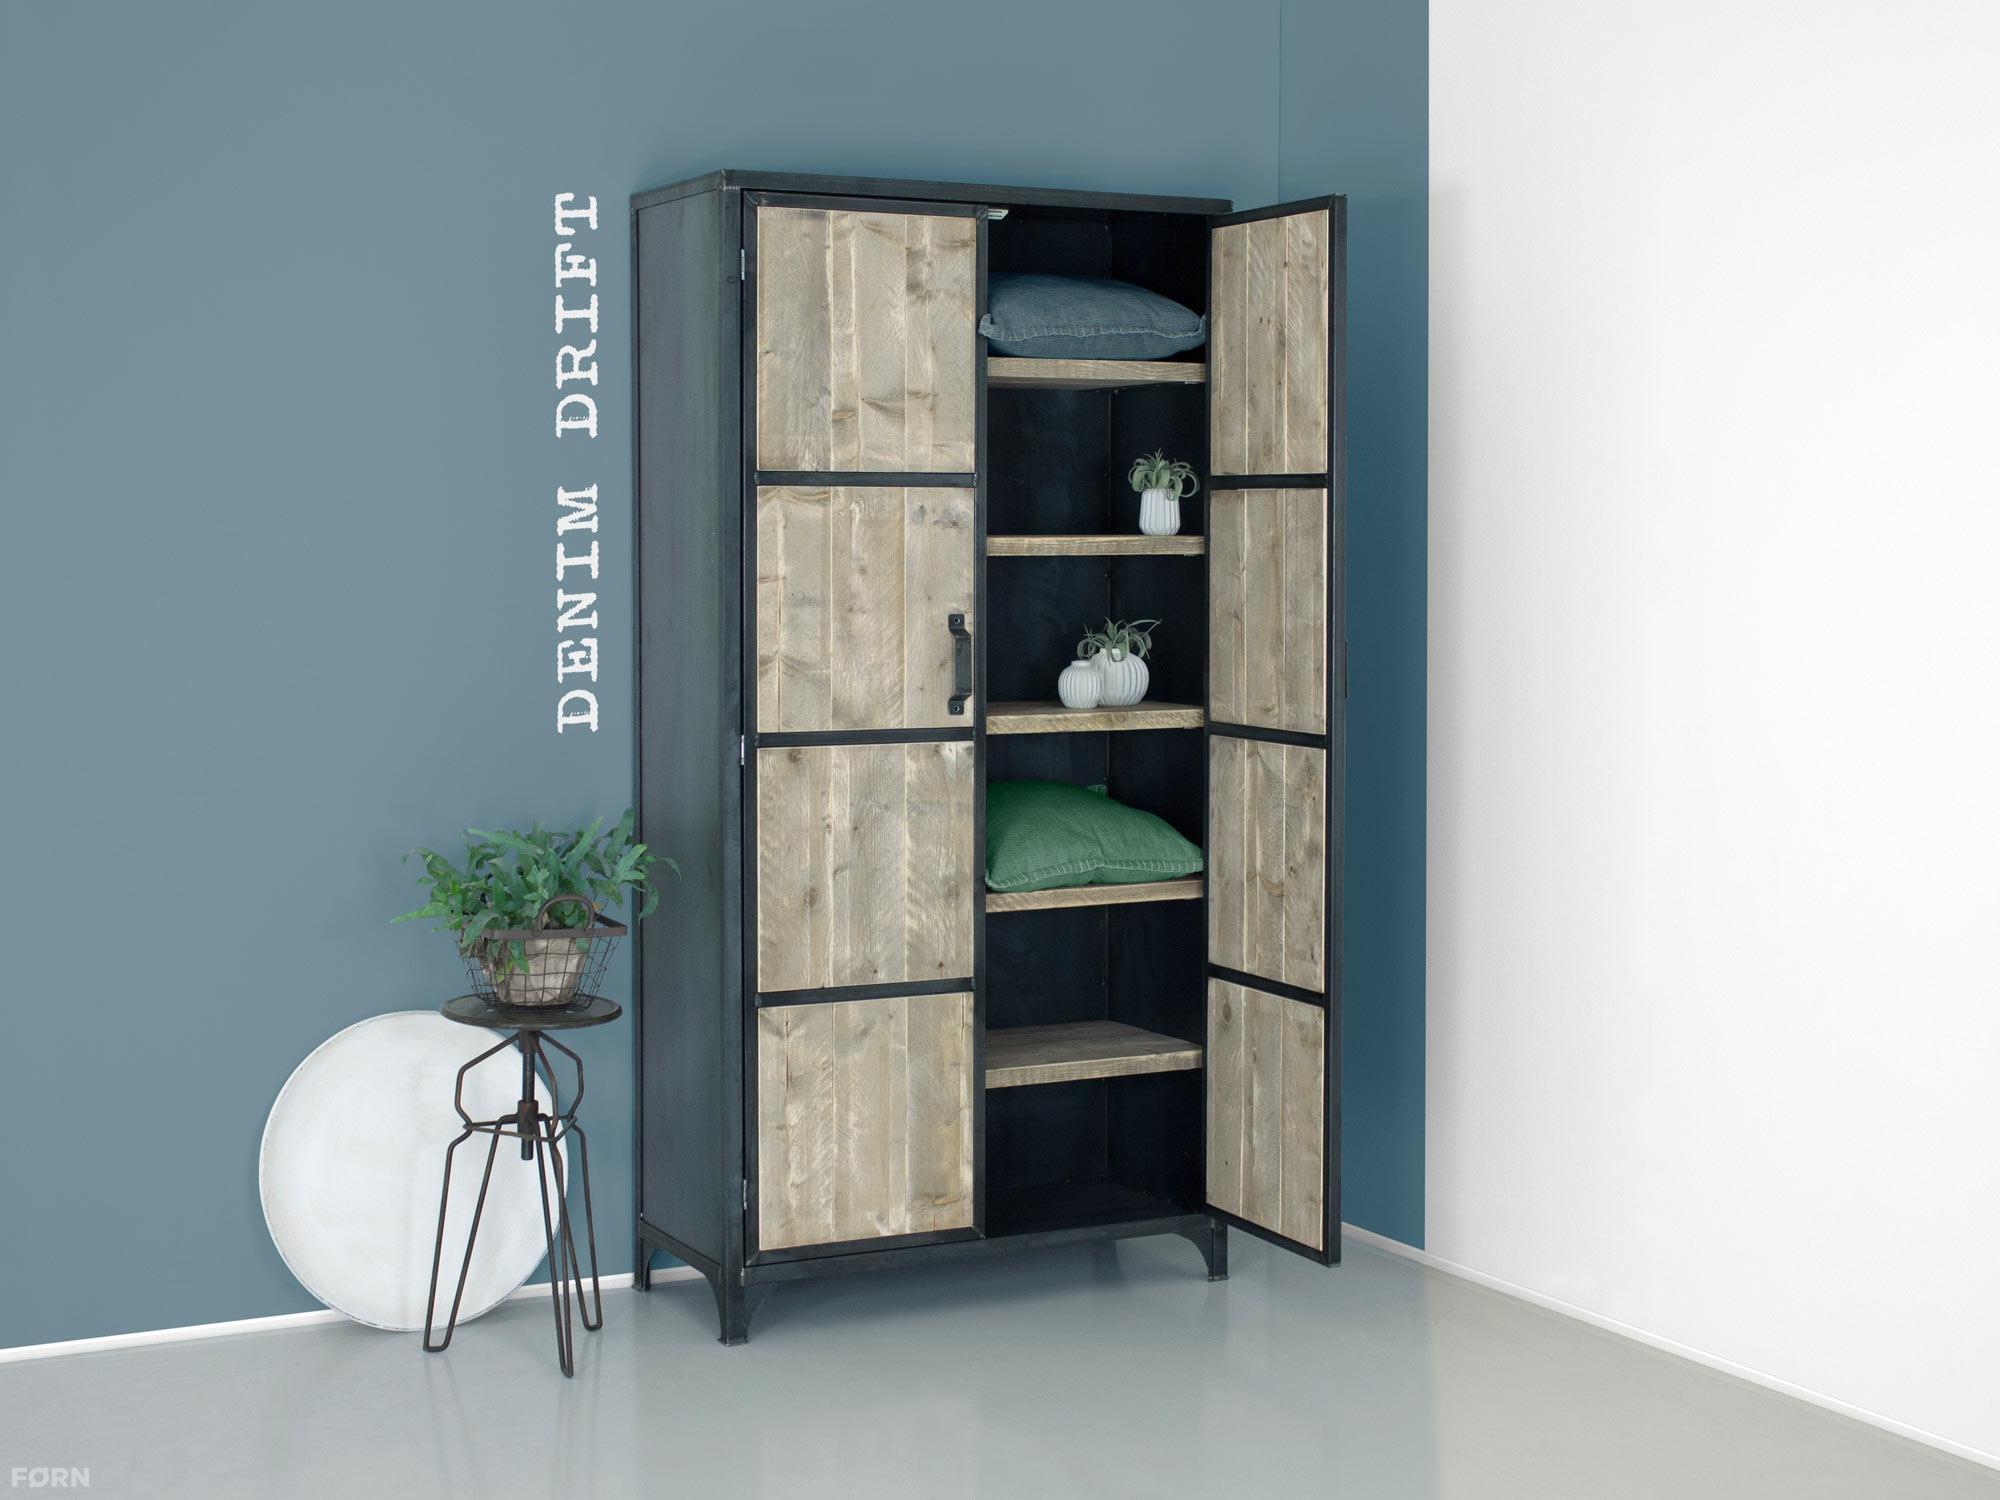 steigerhouten meubelen kopen? steigerhoutenmeubelshop.nl, Deco ideeën